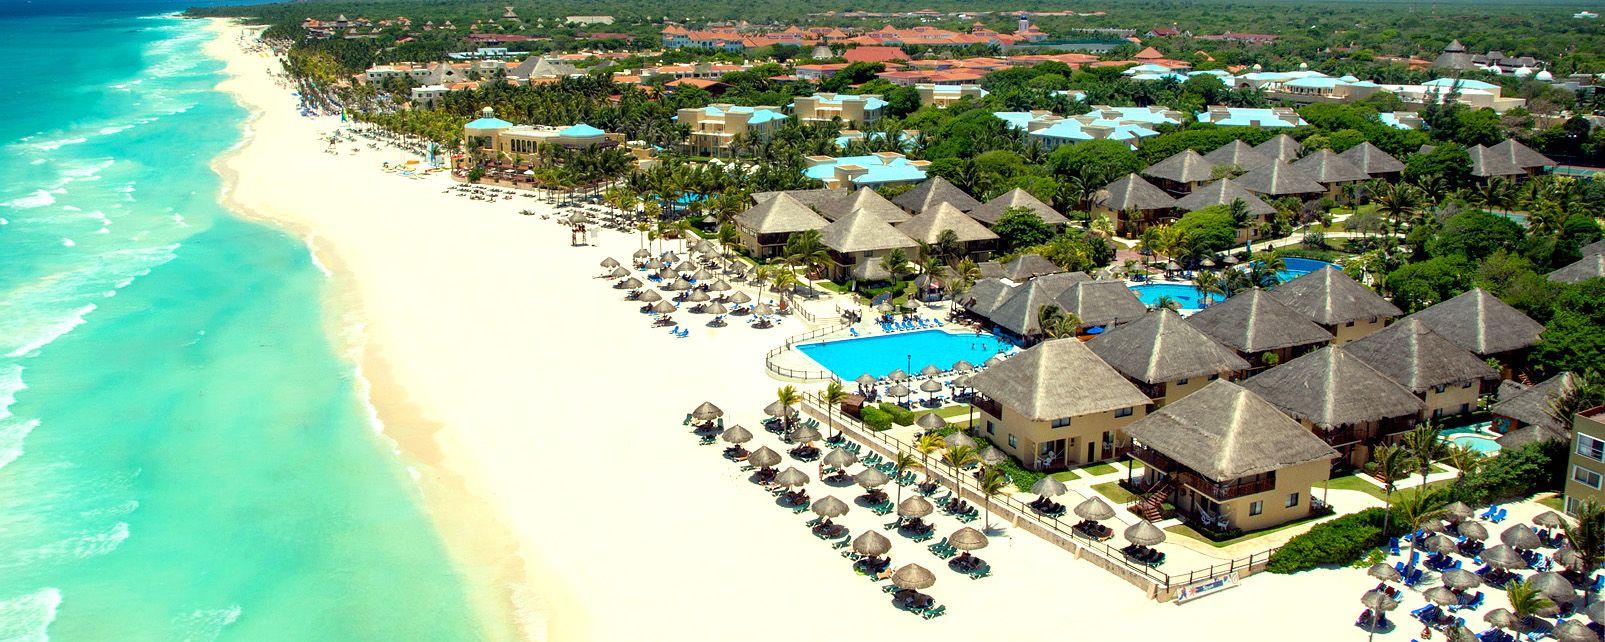 Hotel Allegro Resort Playacar